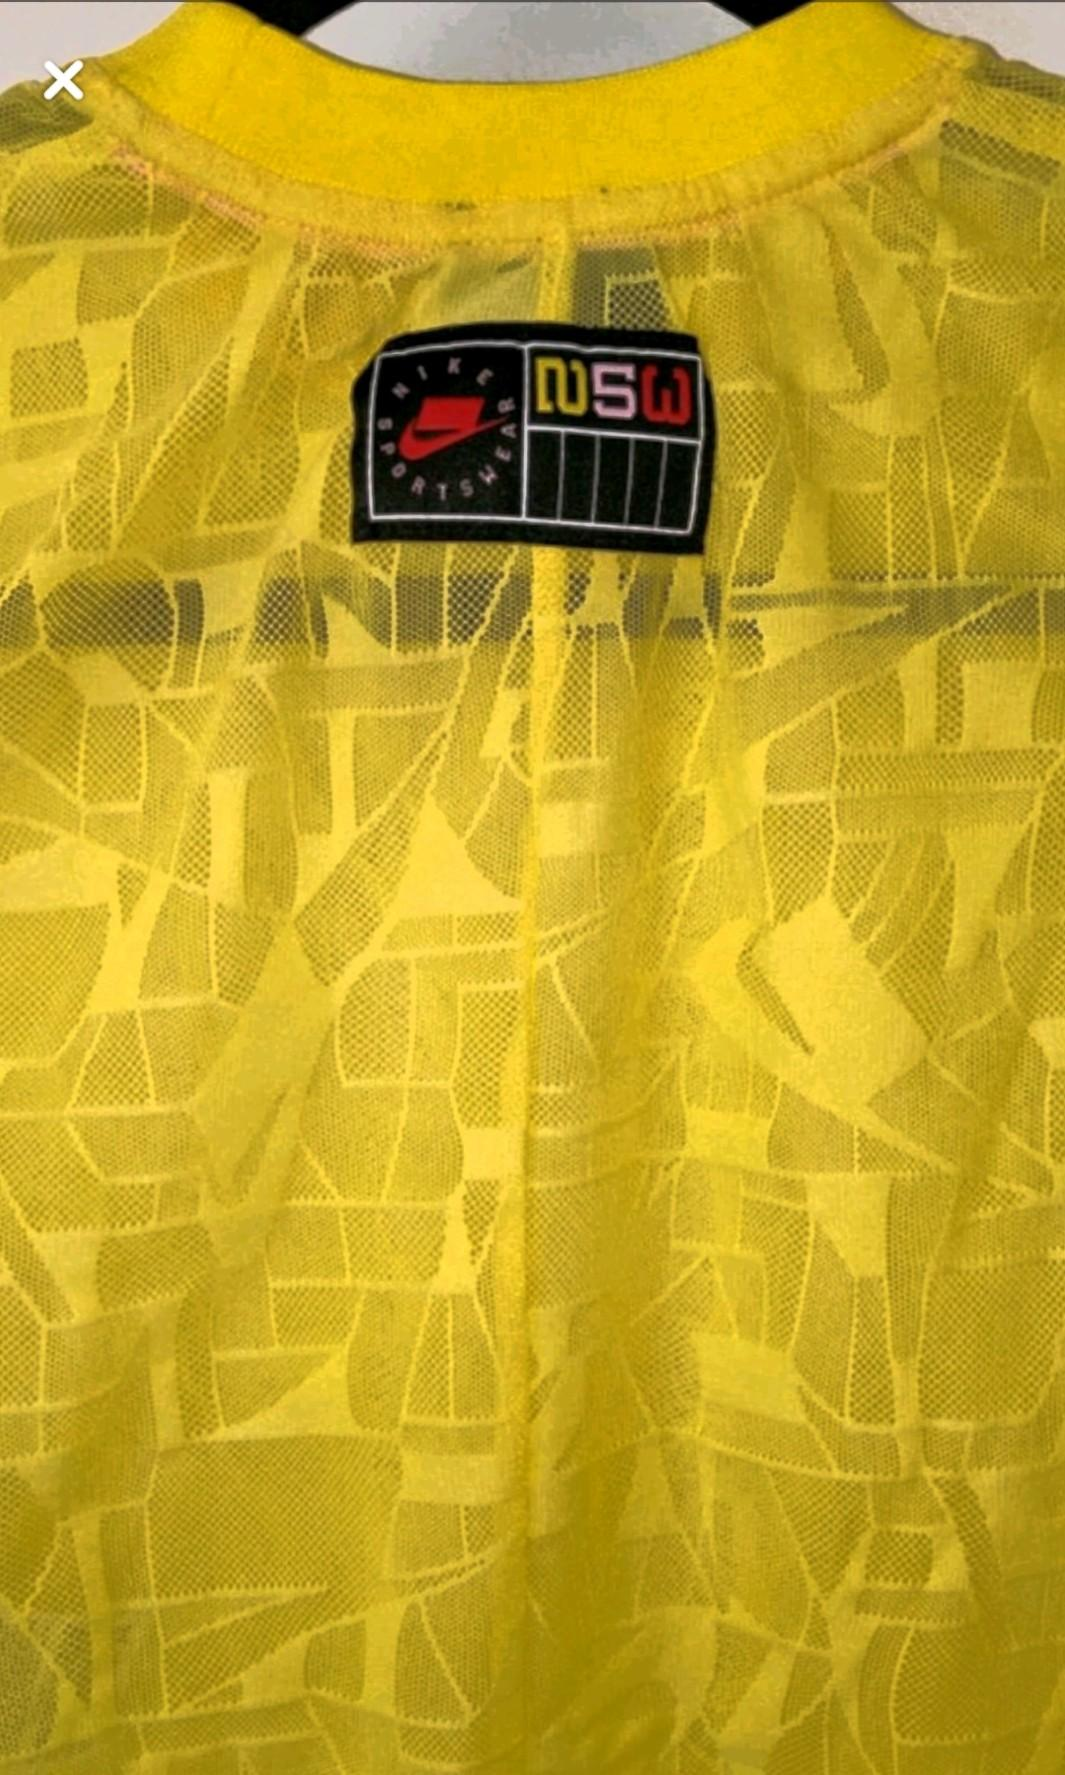 MWT Nike NSW Mesh bodysuit!